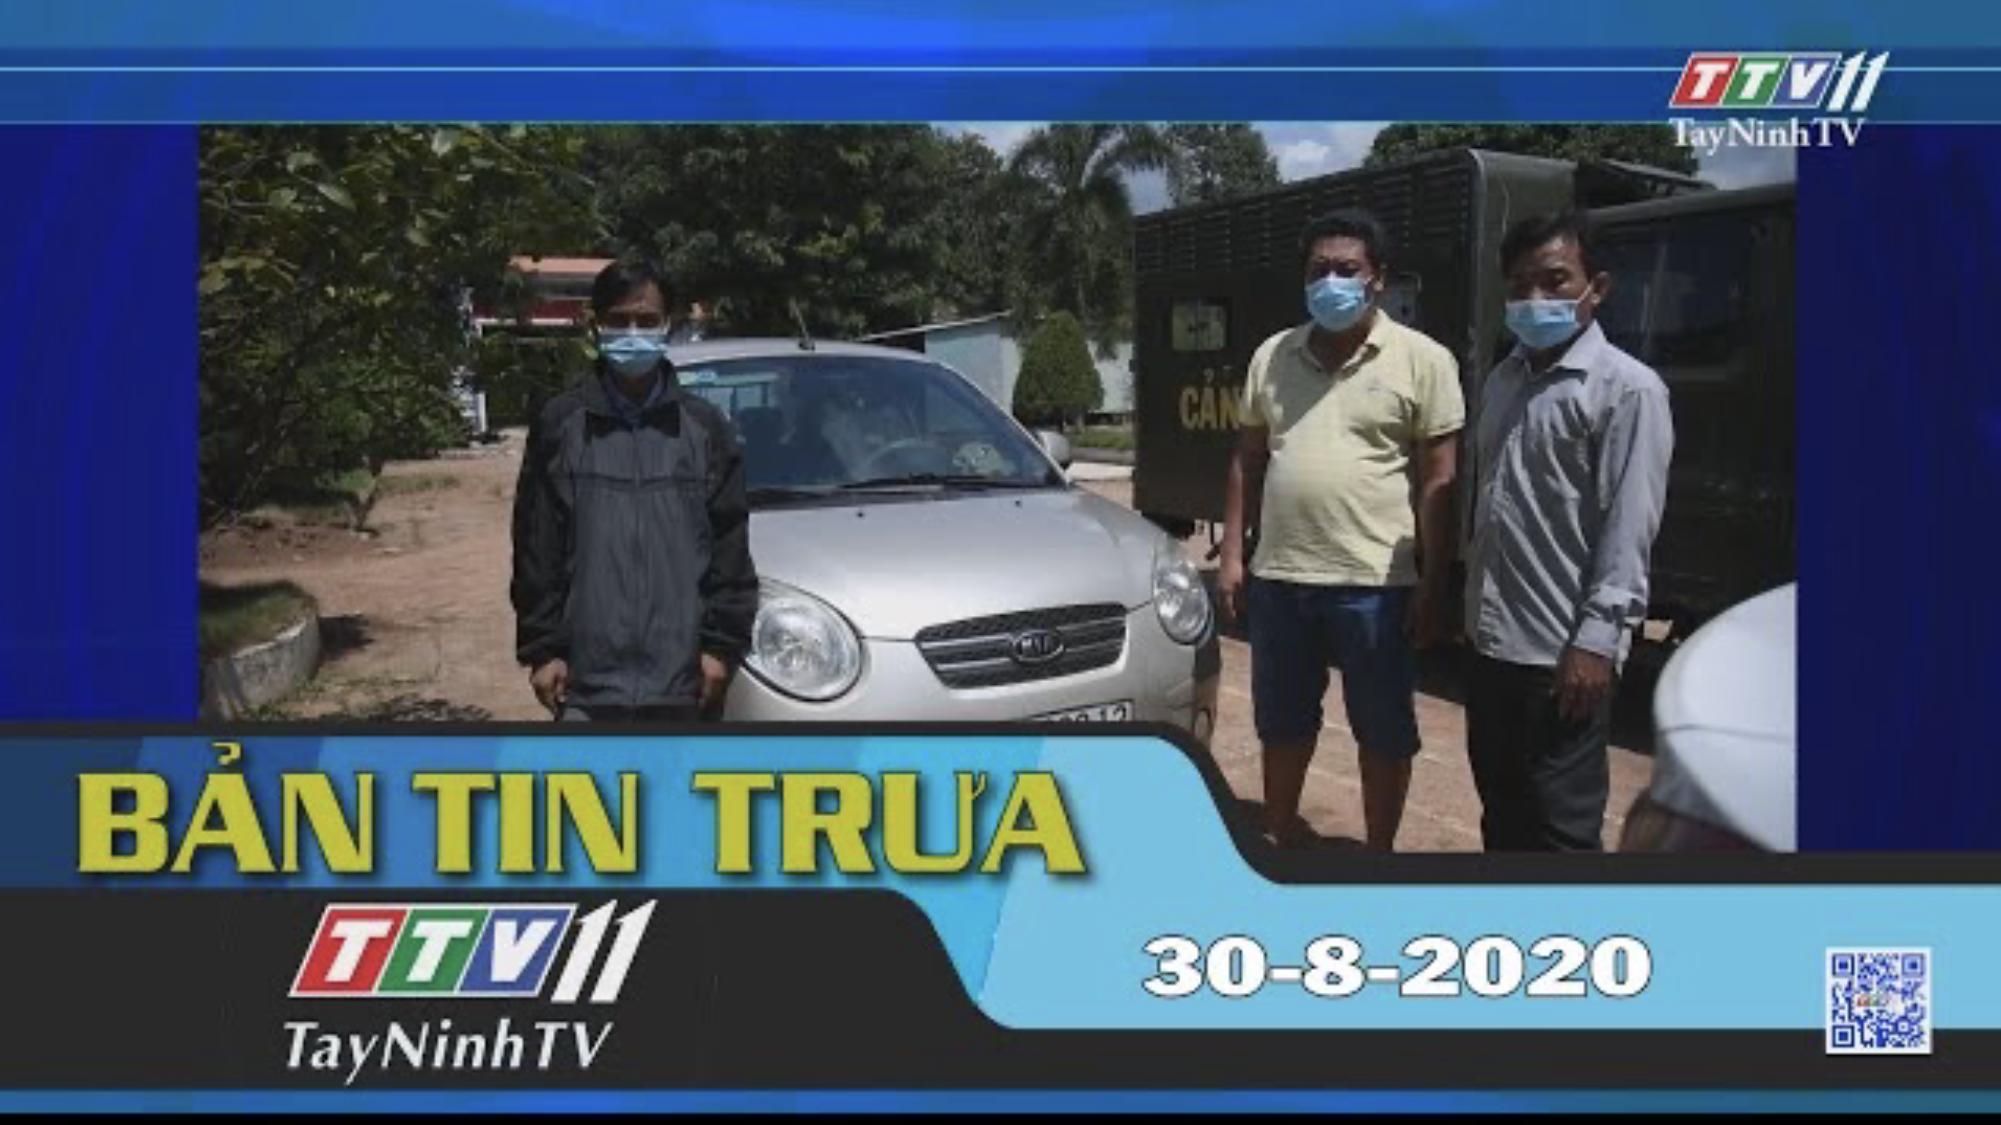 Bản tin trưa 30-8-2020 | Tin tức hôm nay | TayNinhTV